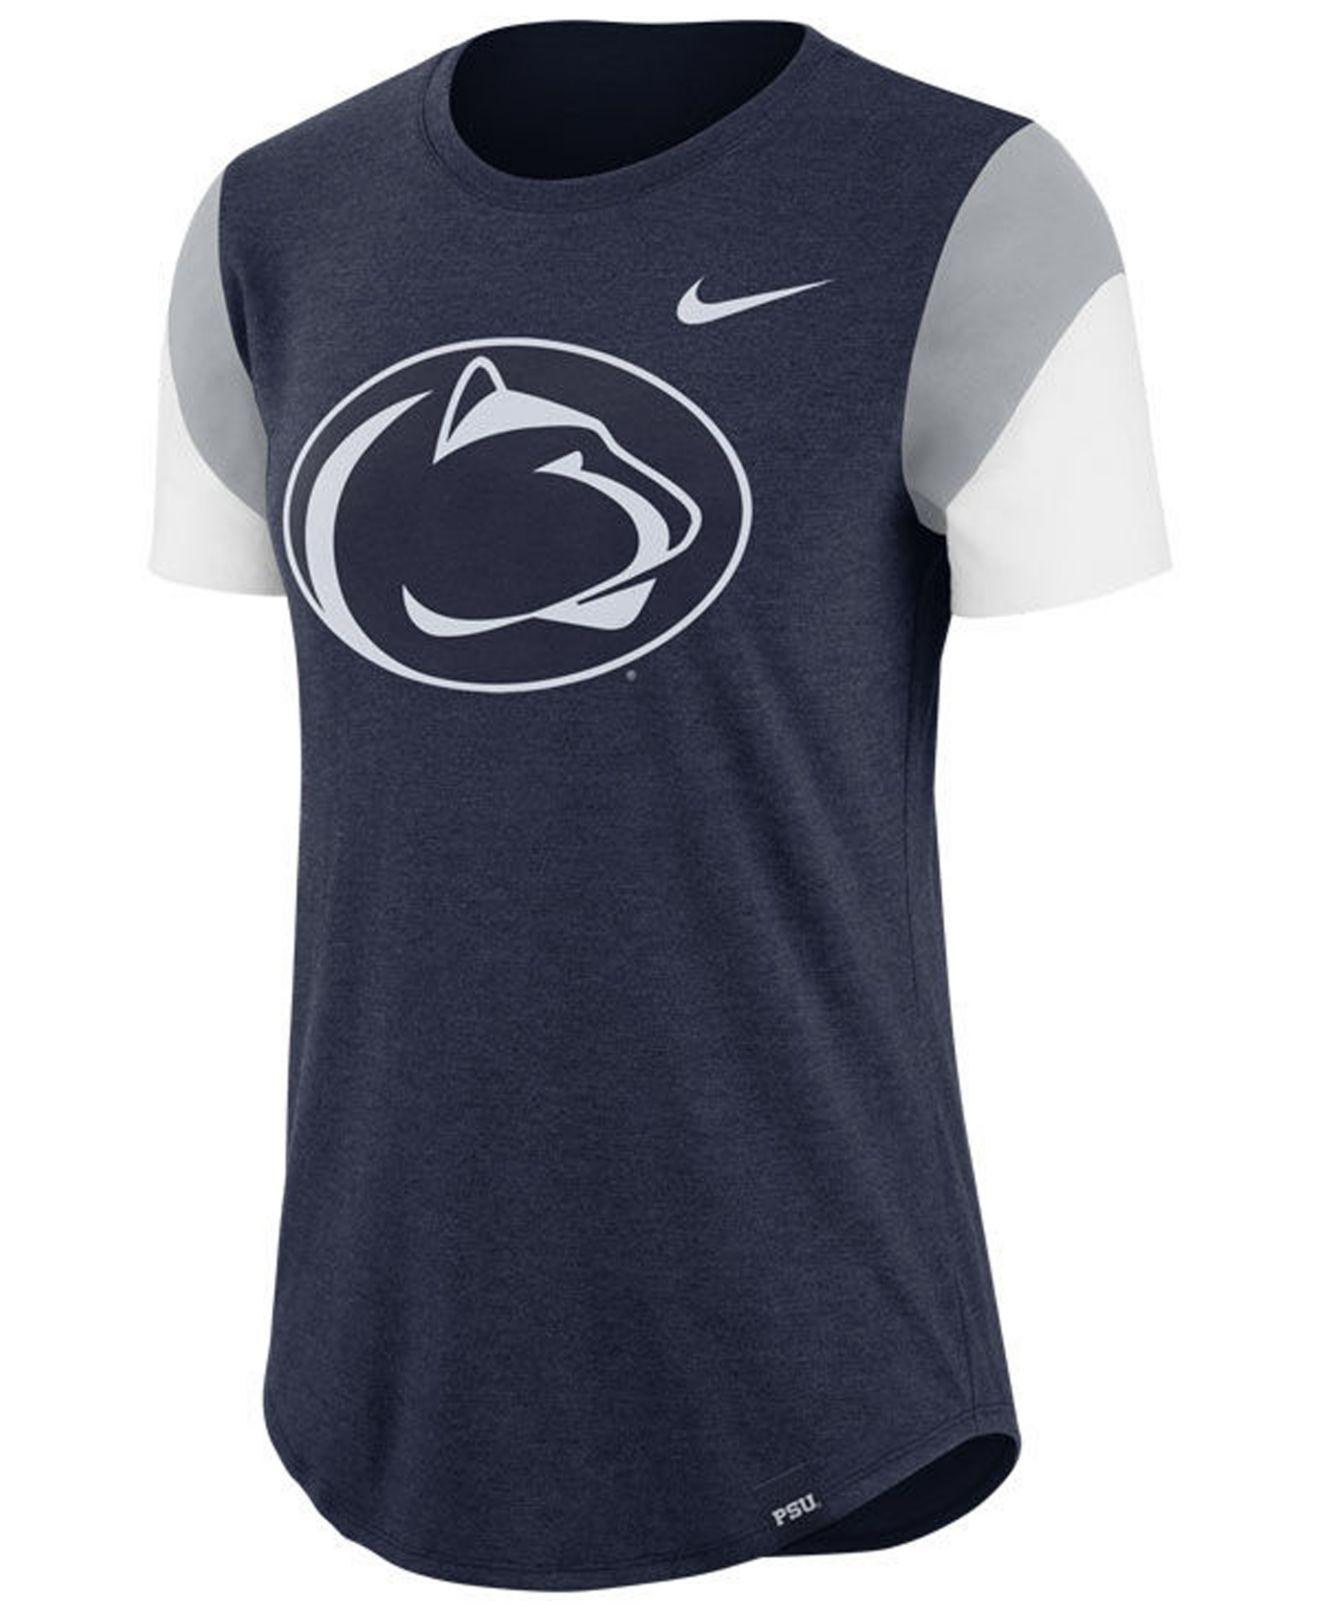 2ab7579a9 Lyst - Nike Penn State Nittany Lions Tri-blend Fan T-shirt in Blue